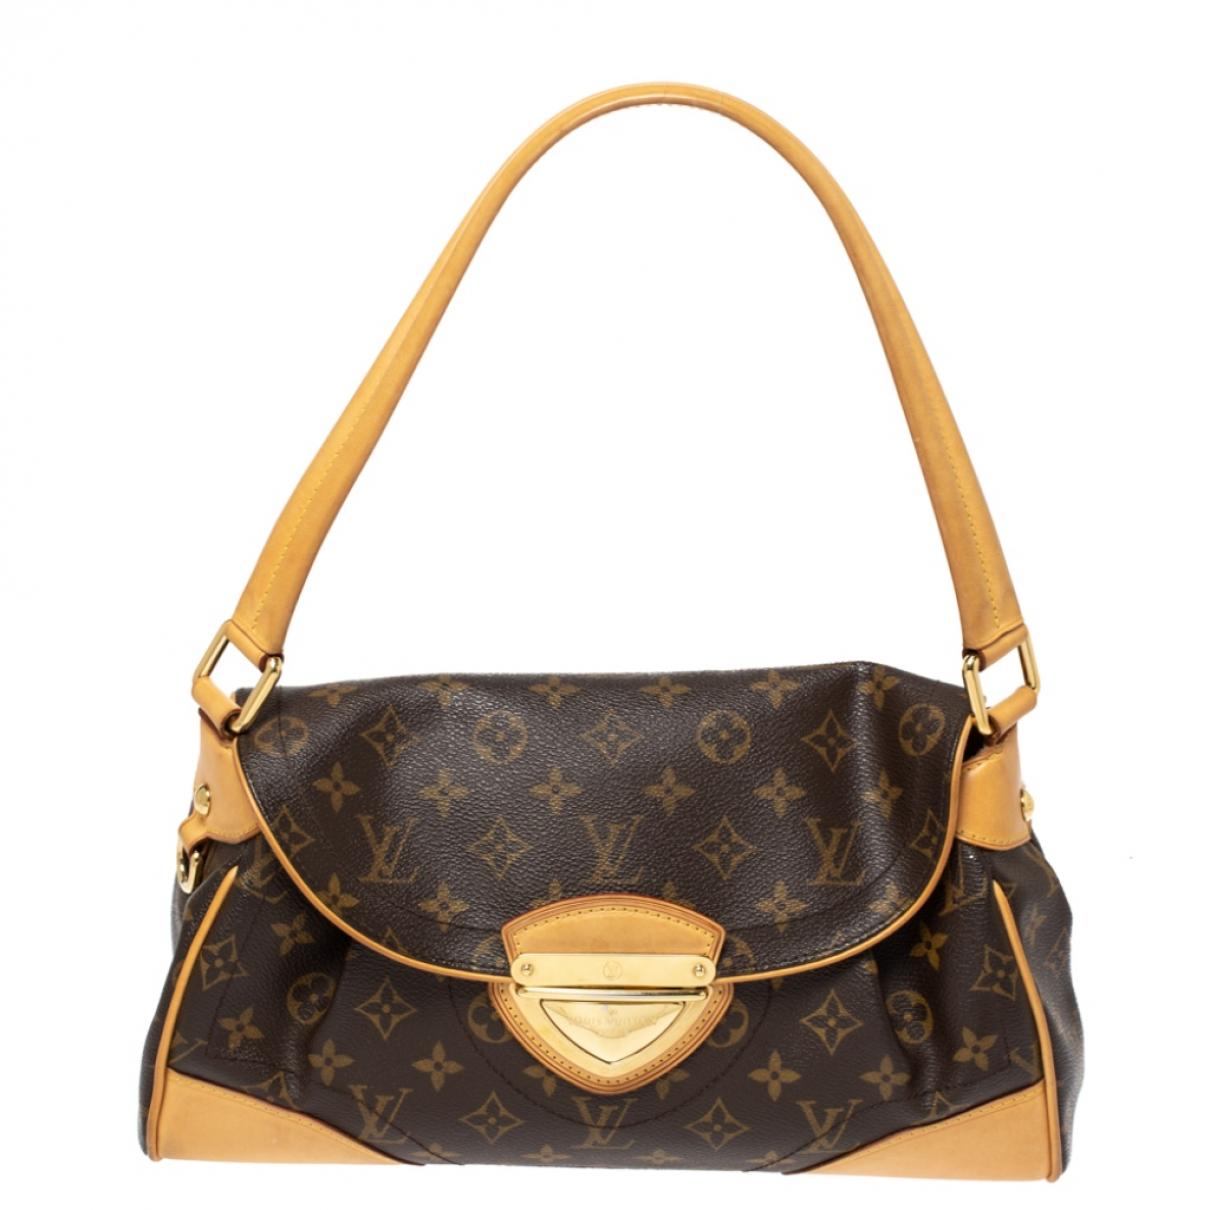 Louis Vuitton Beverly Cloth handbag for Women N